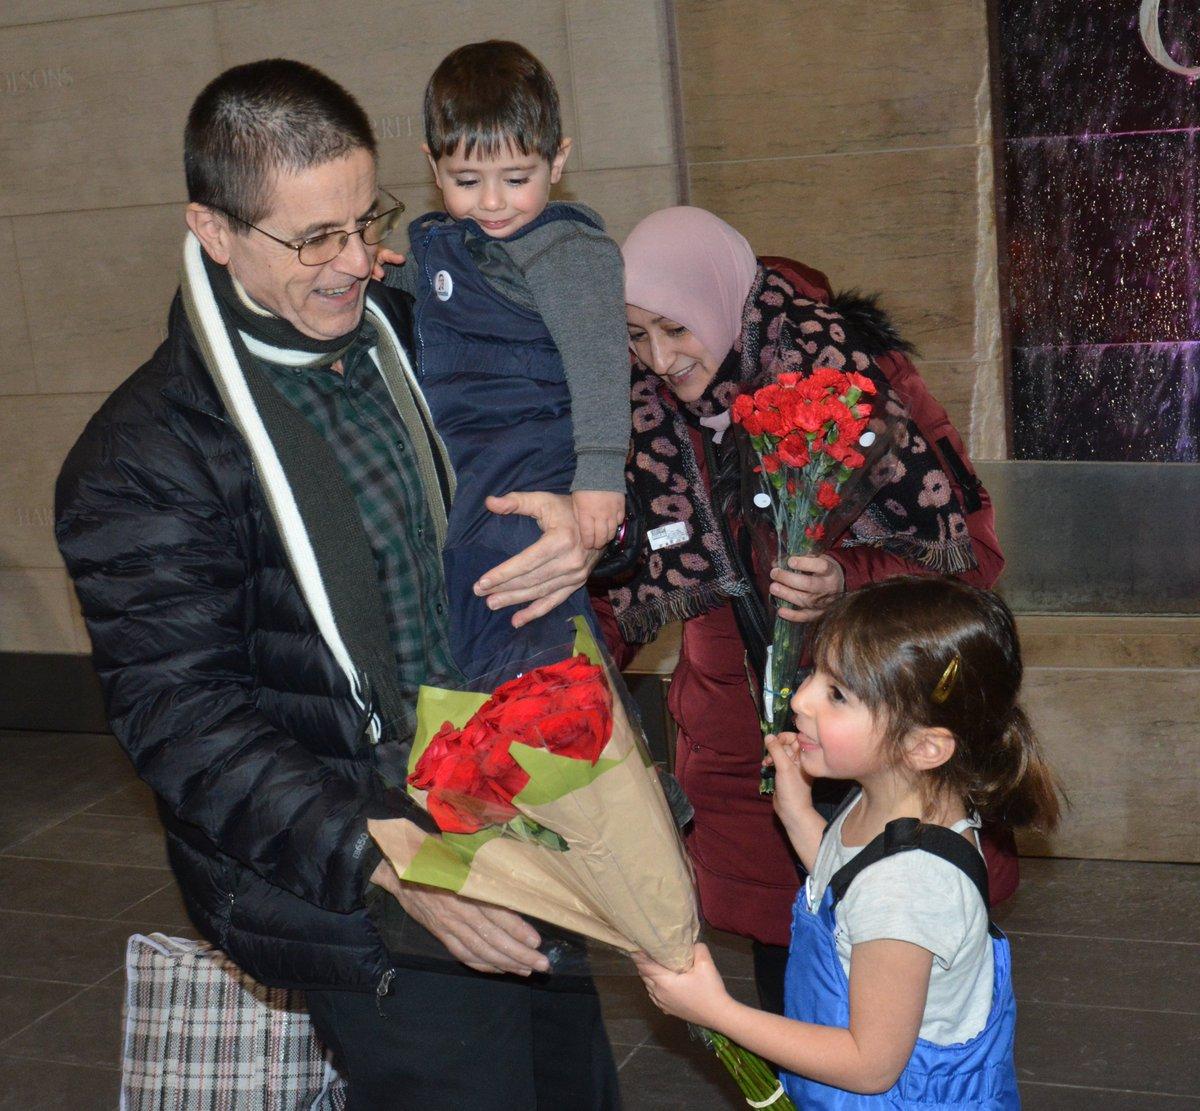 #HassanDiab arrives at #Ottawa airport: free at last!  http://www. justiceforhassandiab.org / &nbsp;   #cdnpoli #justice #law <br>http://pic.twitter.com/ipDeV9qSoV